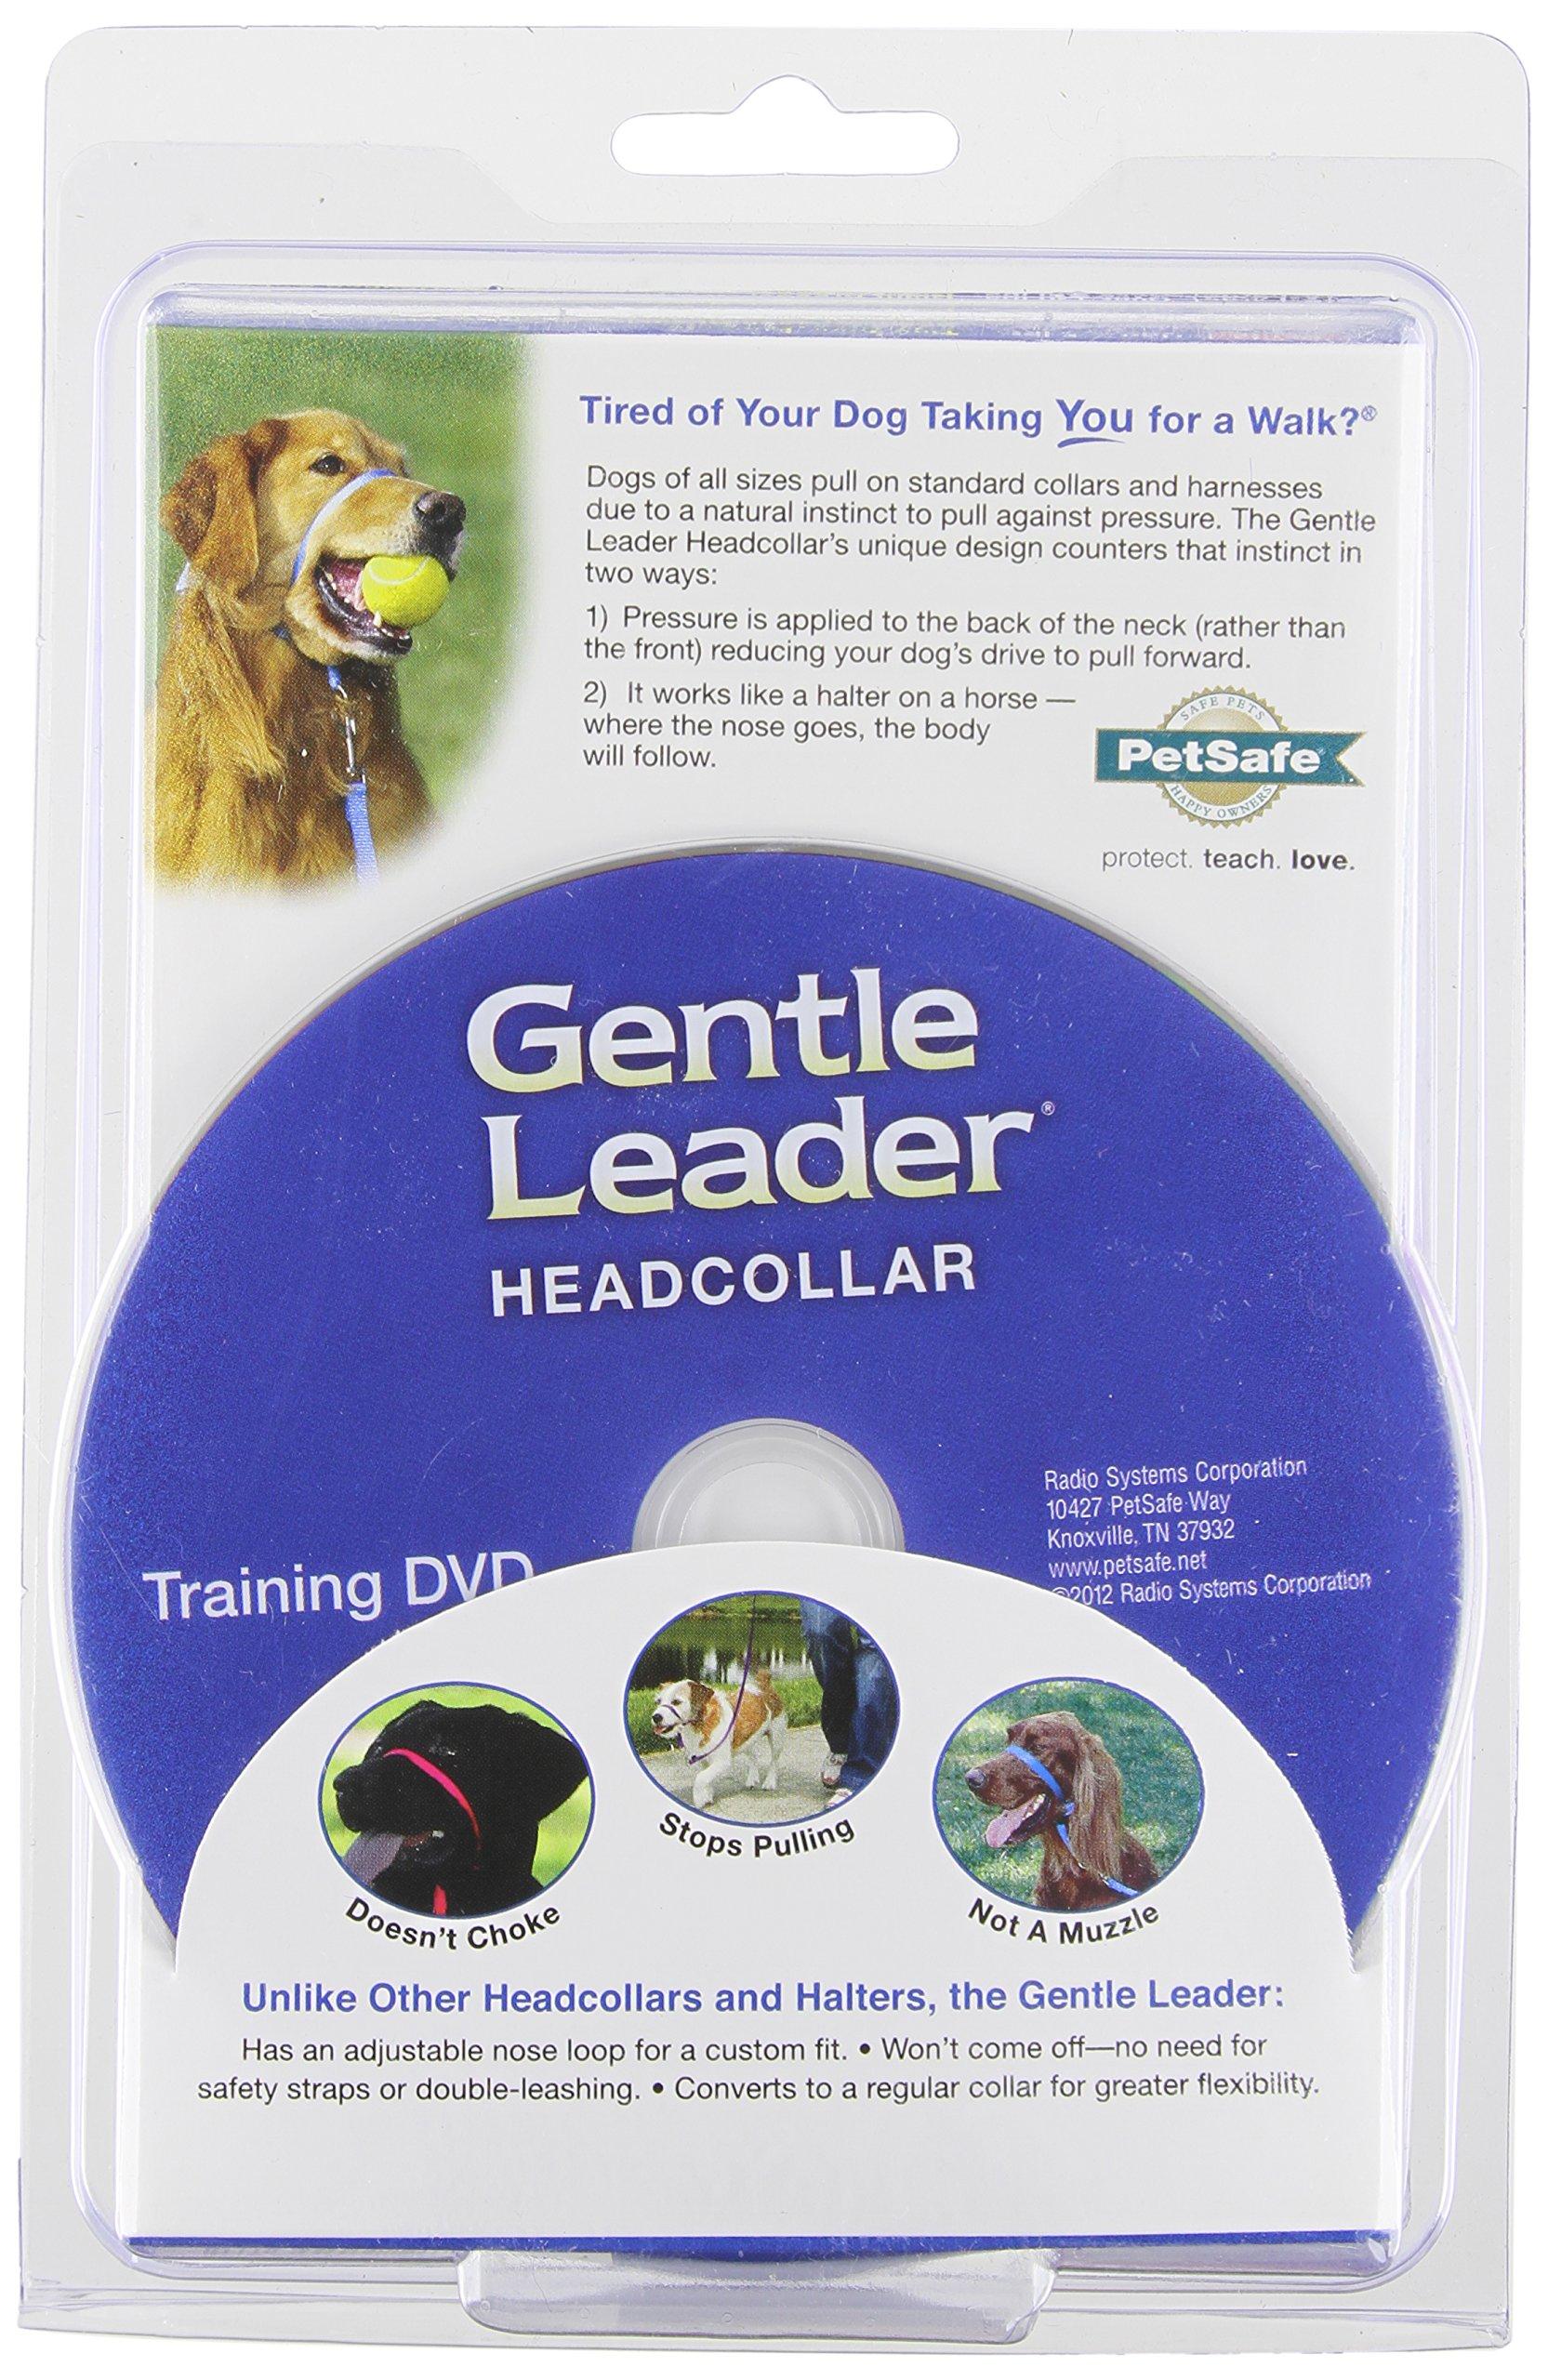 PetSafe Gentle Leader Head Collar with Training DVD, MEDIUM 25-60 LBS., DEEP PURPLE by PetSafe (Image #1)